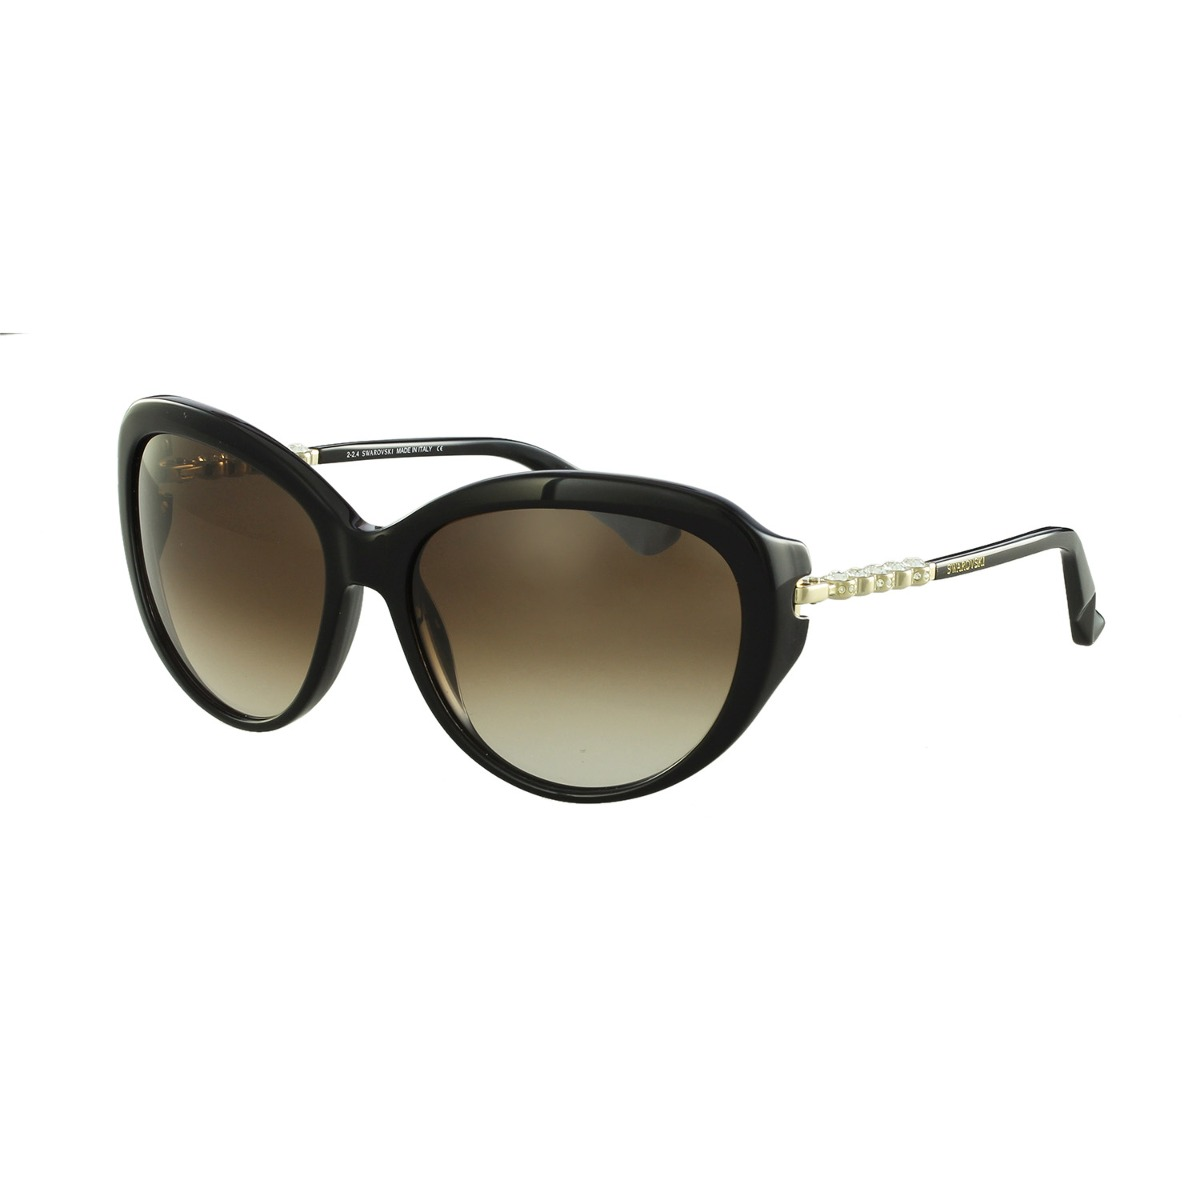 8b3c184e9ec96 óculos de sol swarovski fashion preto. Carregando zoom.